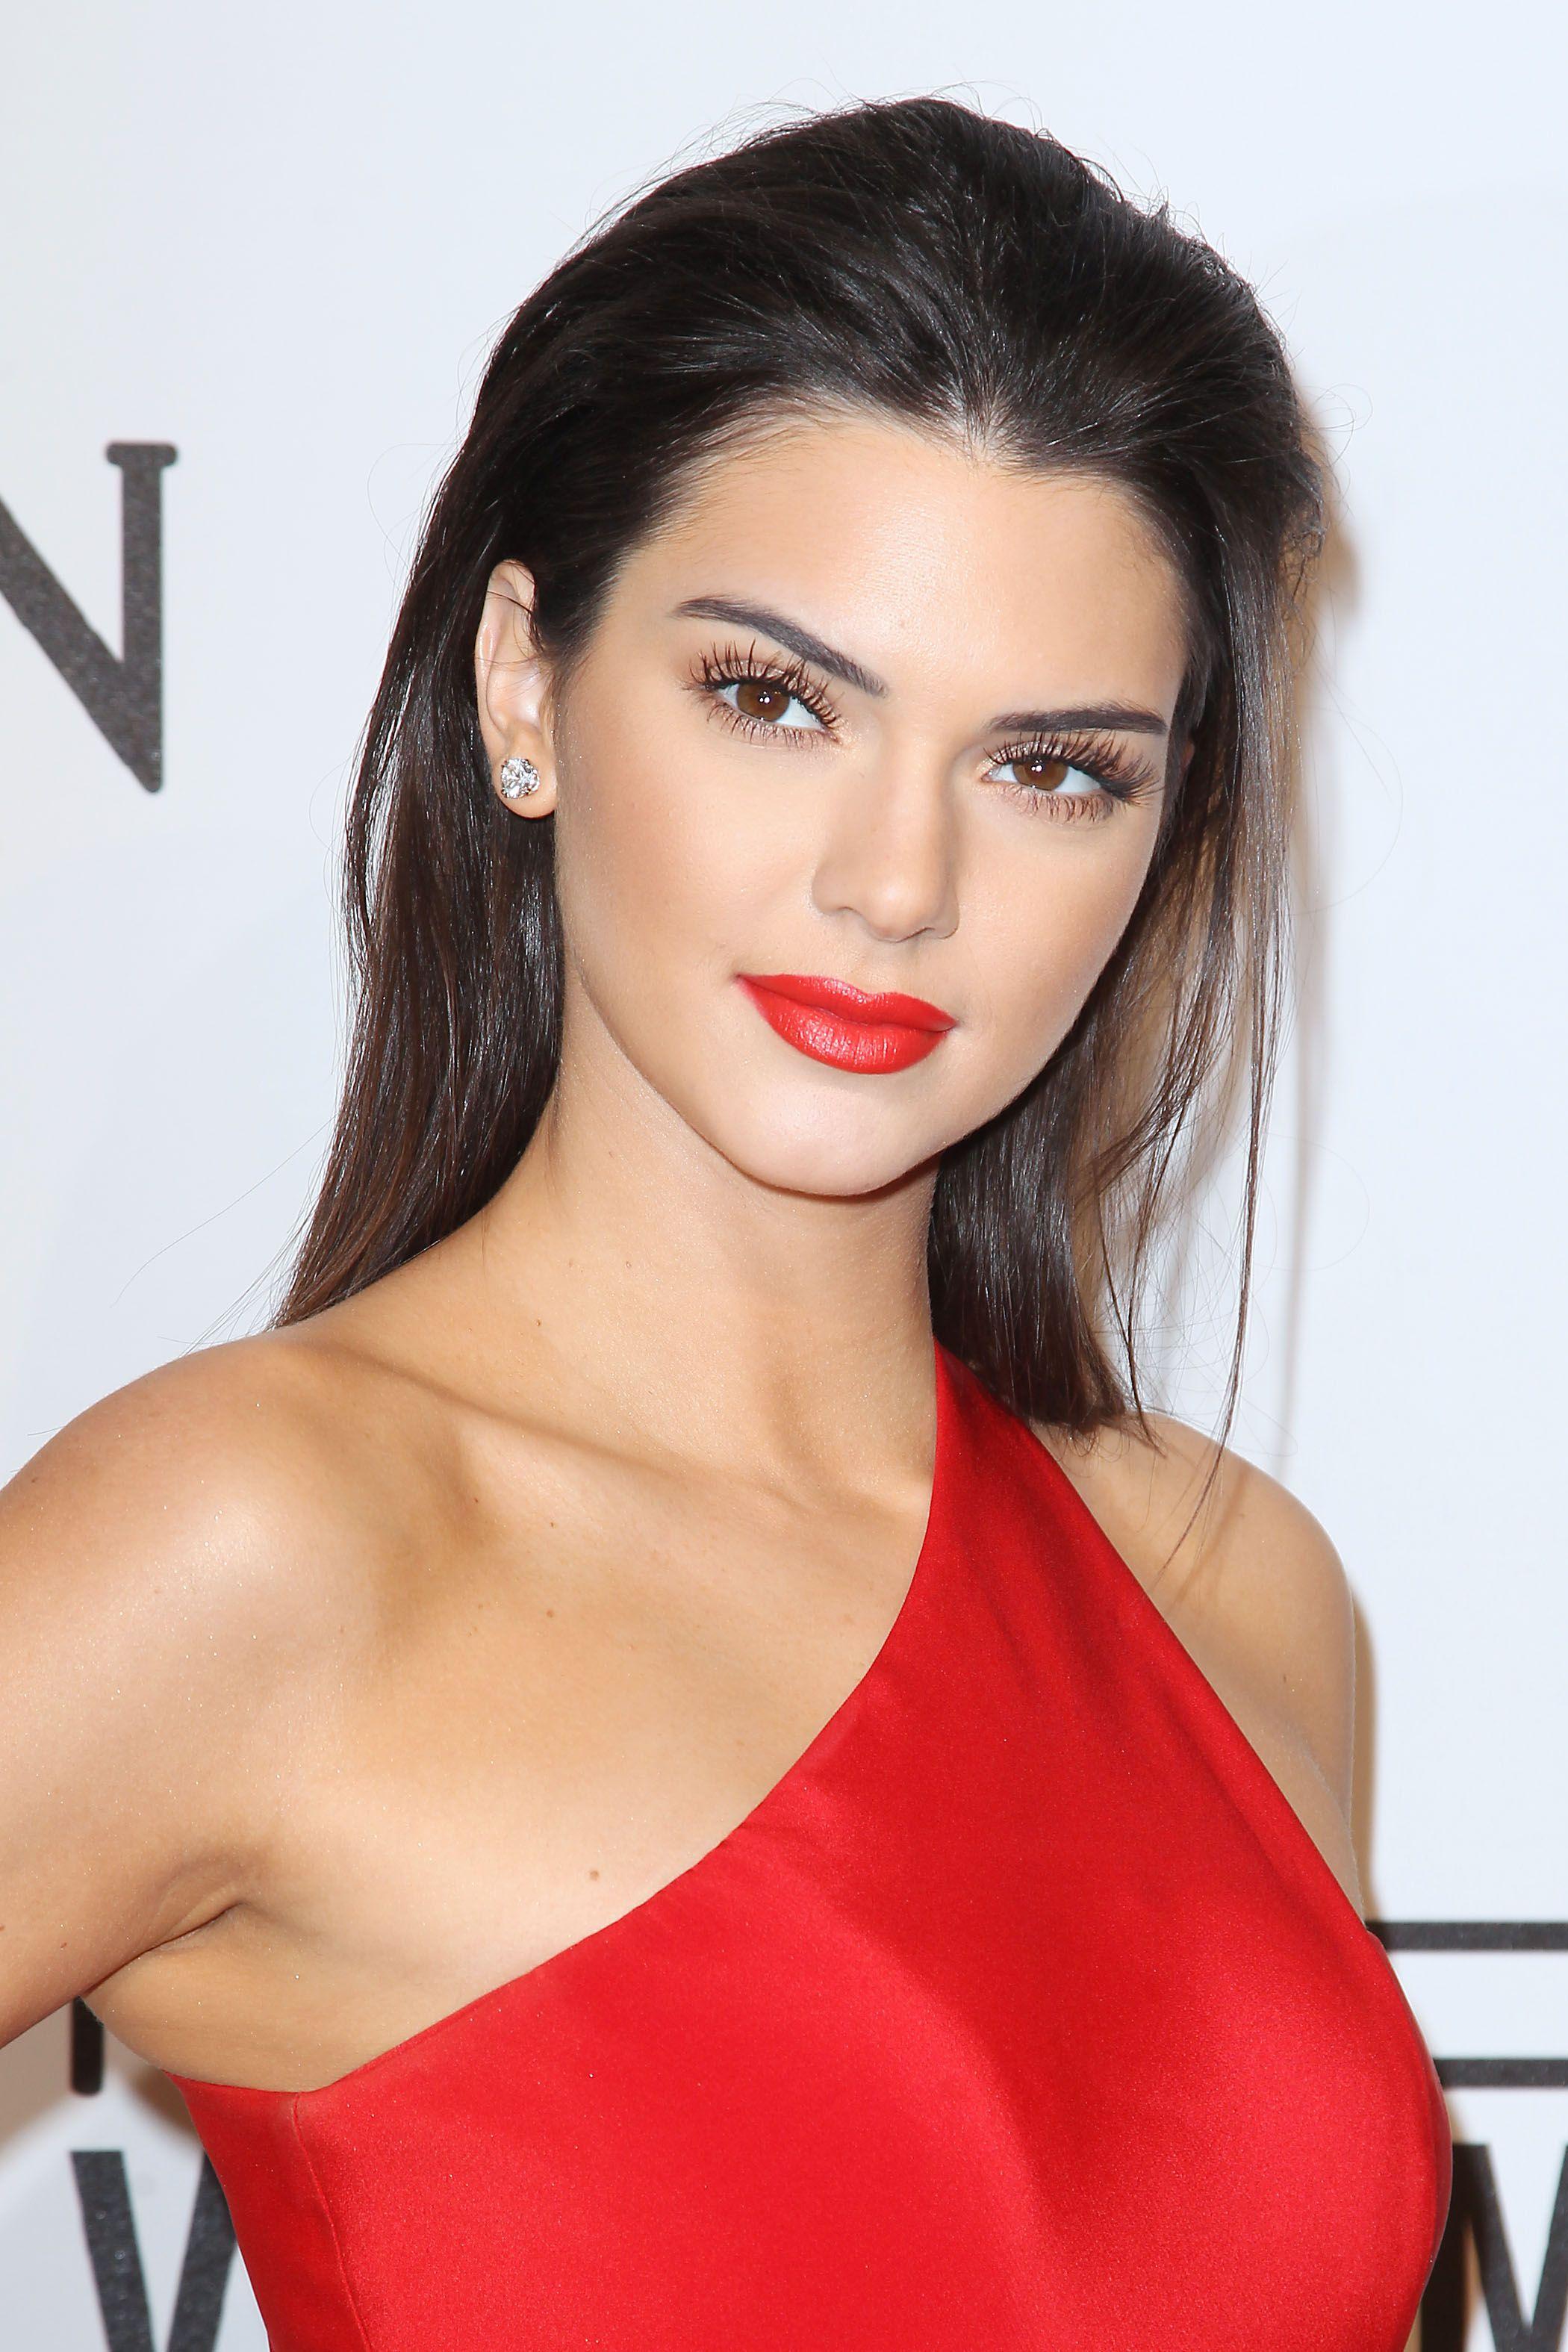 Kendall Jenner in Romona Keveza Fall 2014 gown, Harry Winston jewelry and Christian Louboutin 'Iriza' pumps – 2015 #amfAR New York Gala @romonakeveza